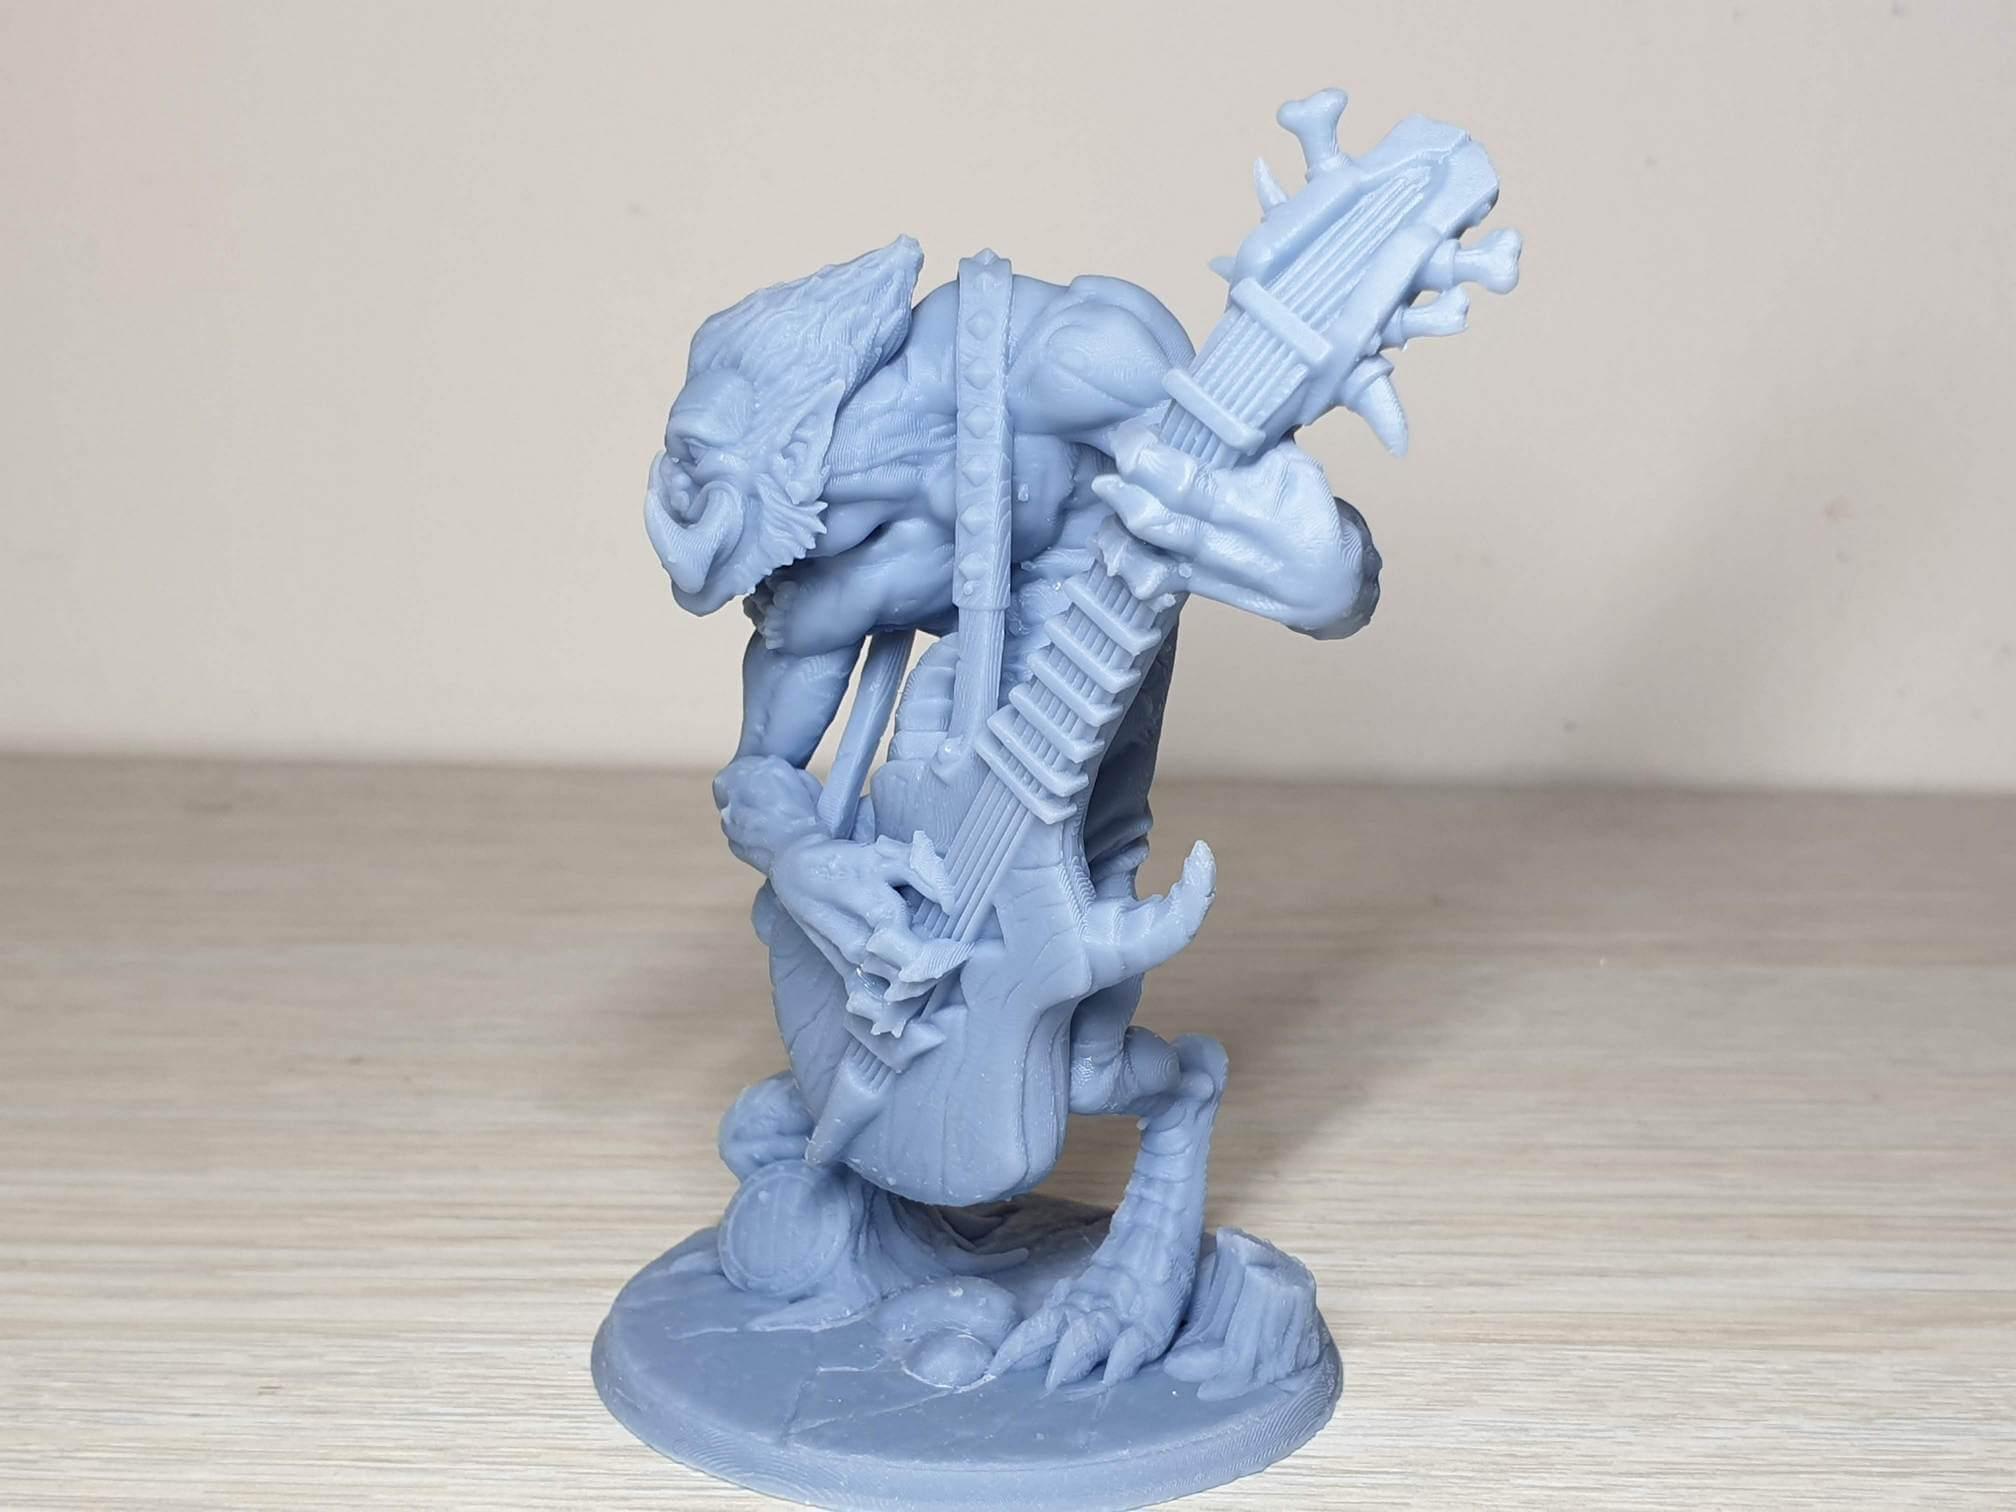 Gunlutt the Troll Guitarist Budget Resin Printer 5   Anycubic Photon Zero Review - Budget Resin Printer